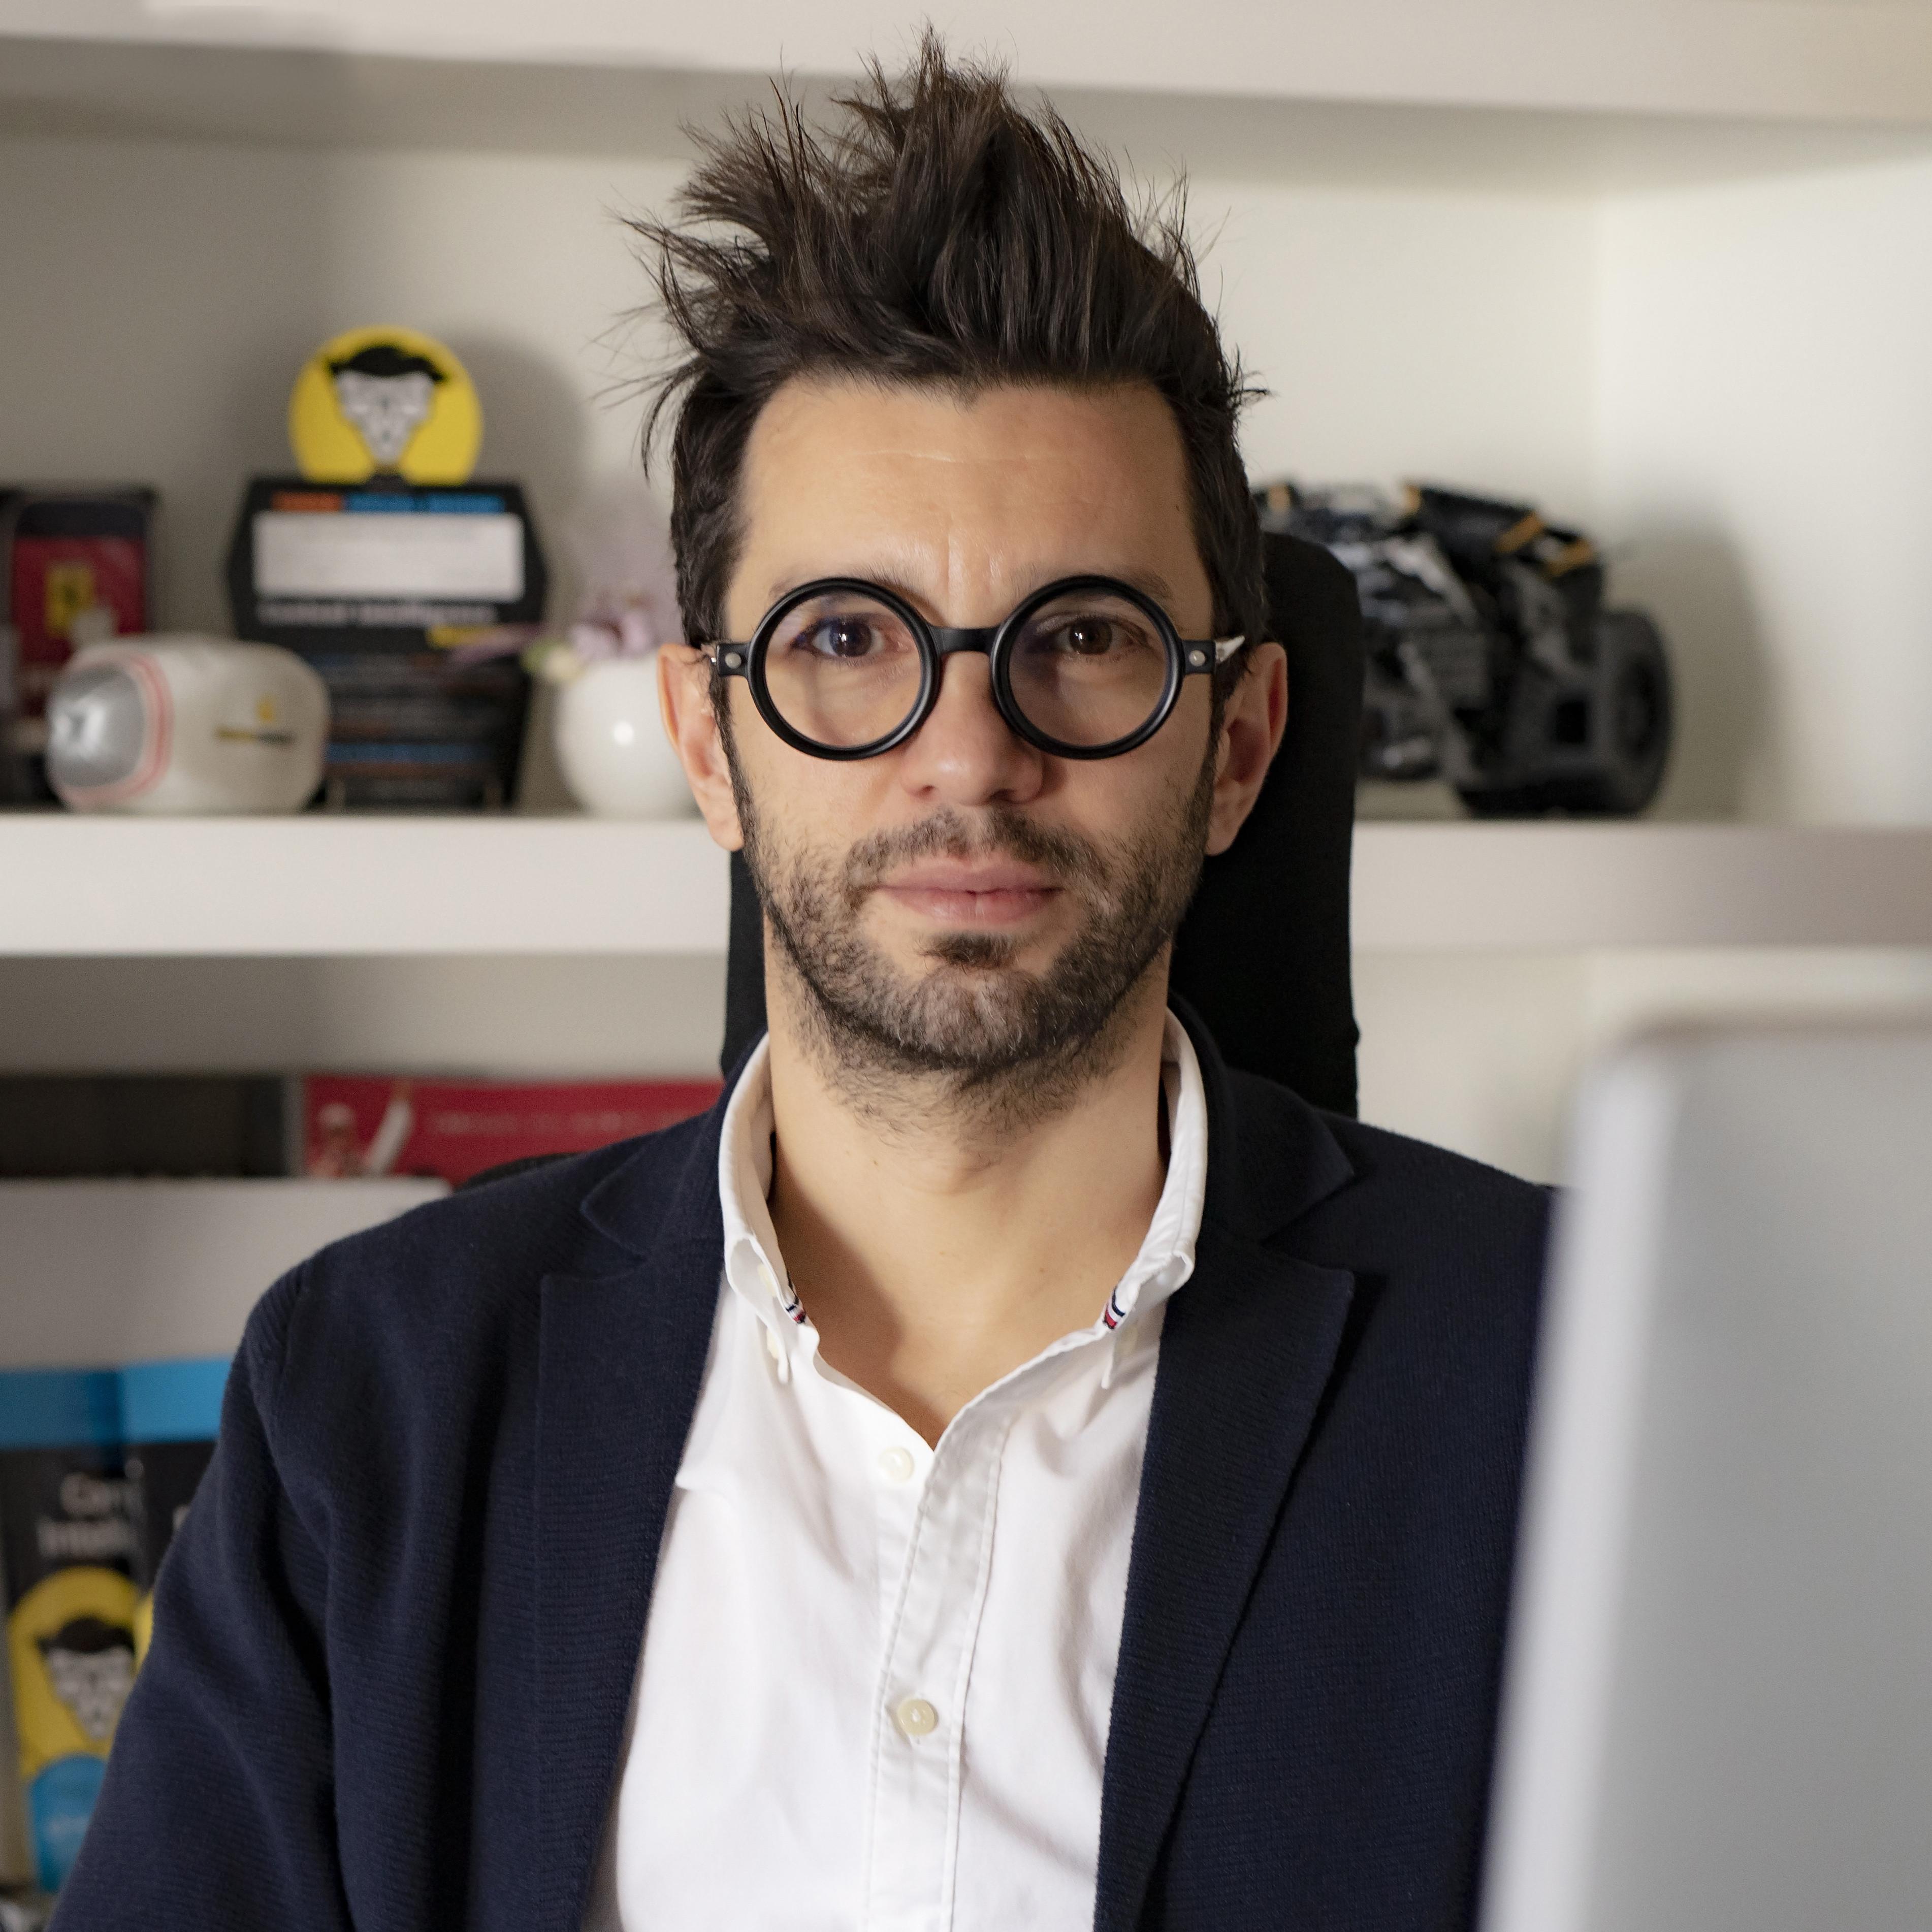 Nicola Meneghello - CEO e Founder di THRON